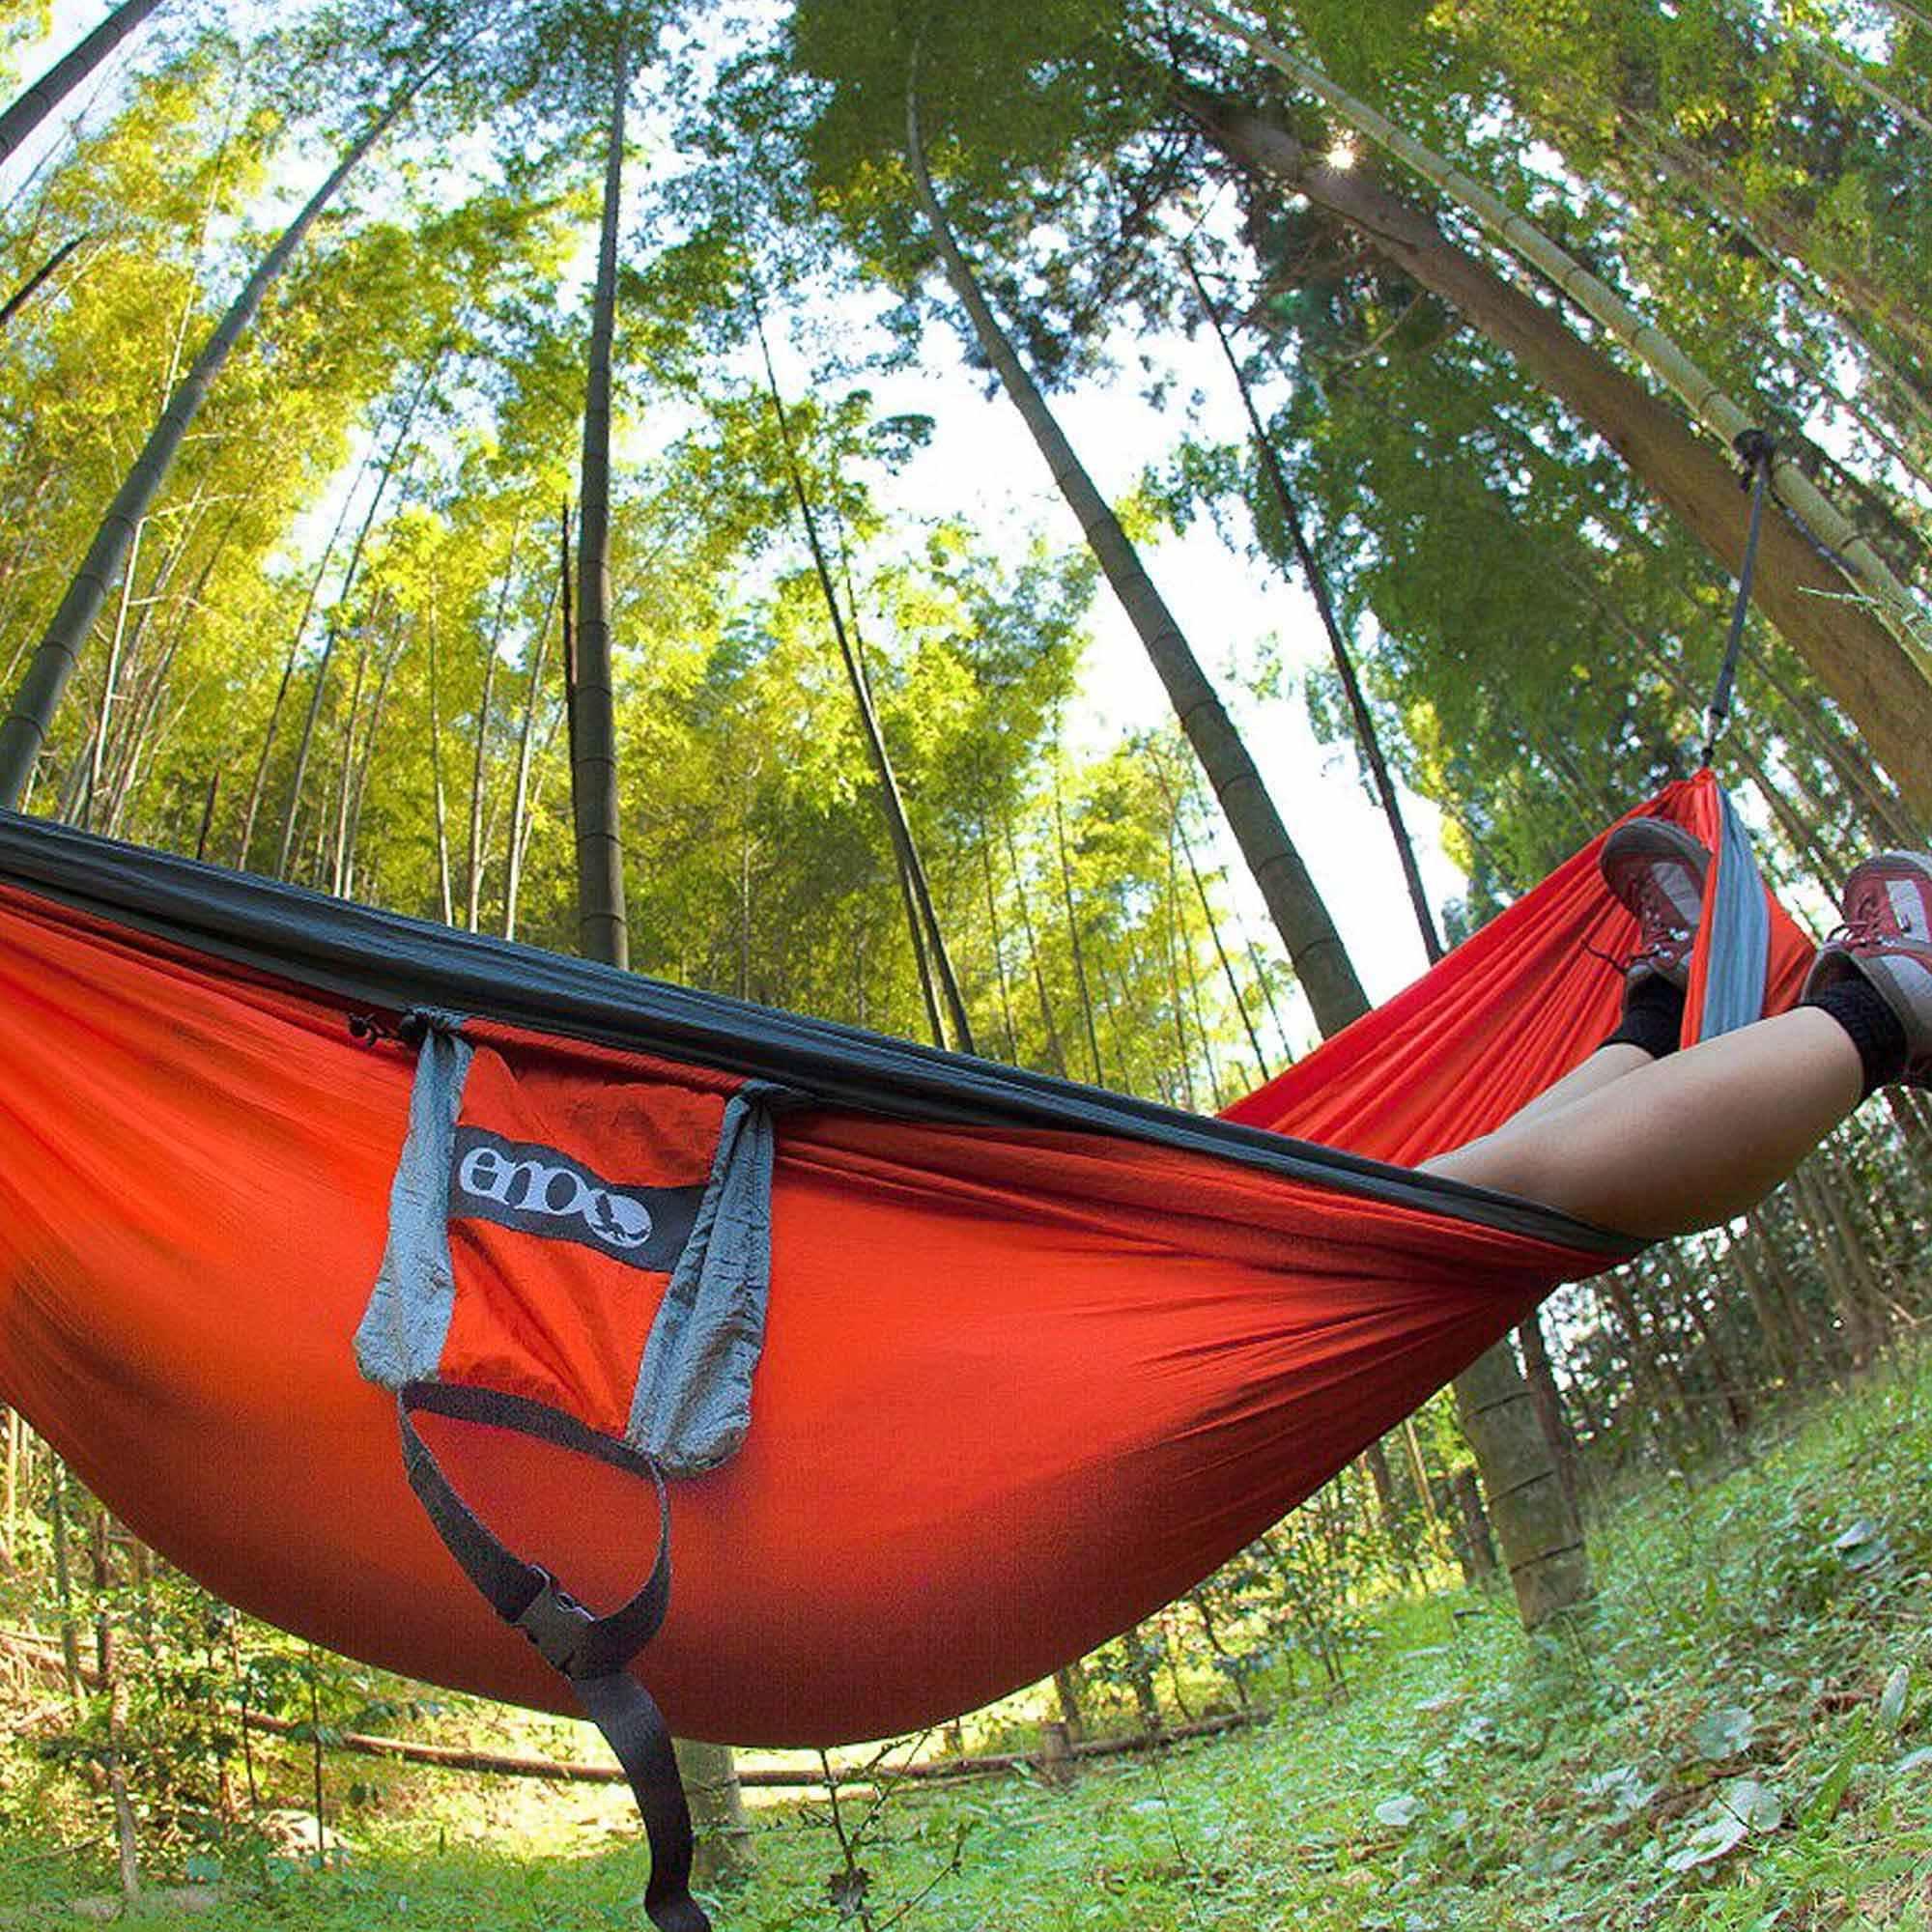 Eno Double Deluxe Camping Hammock